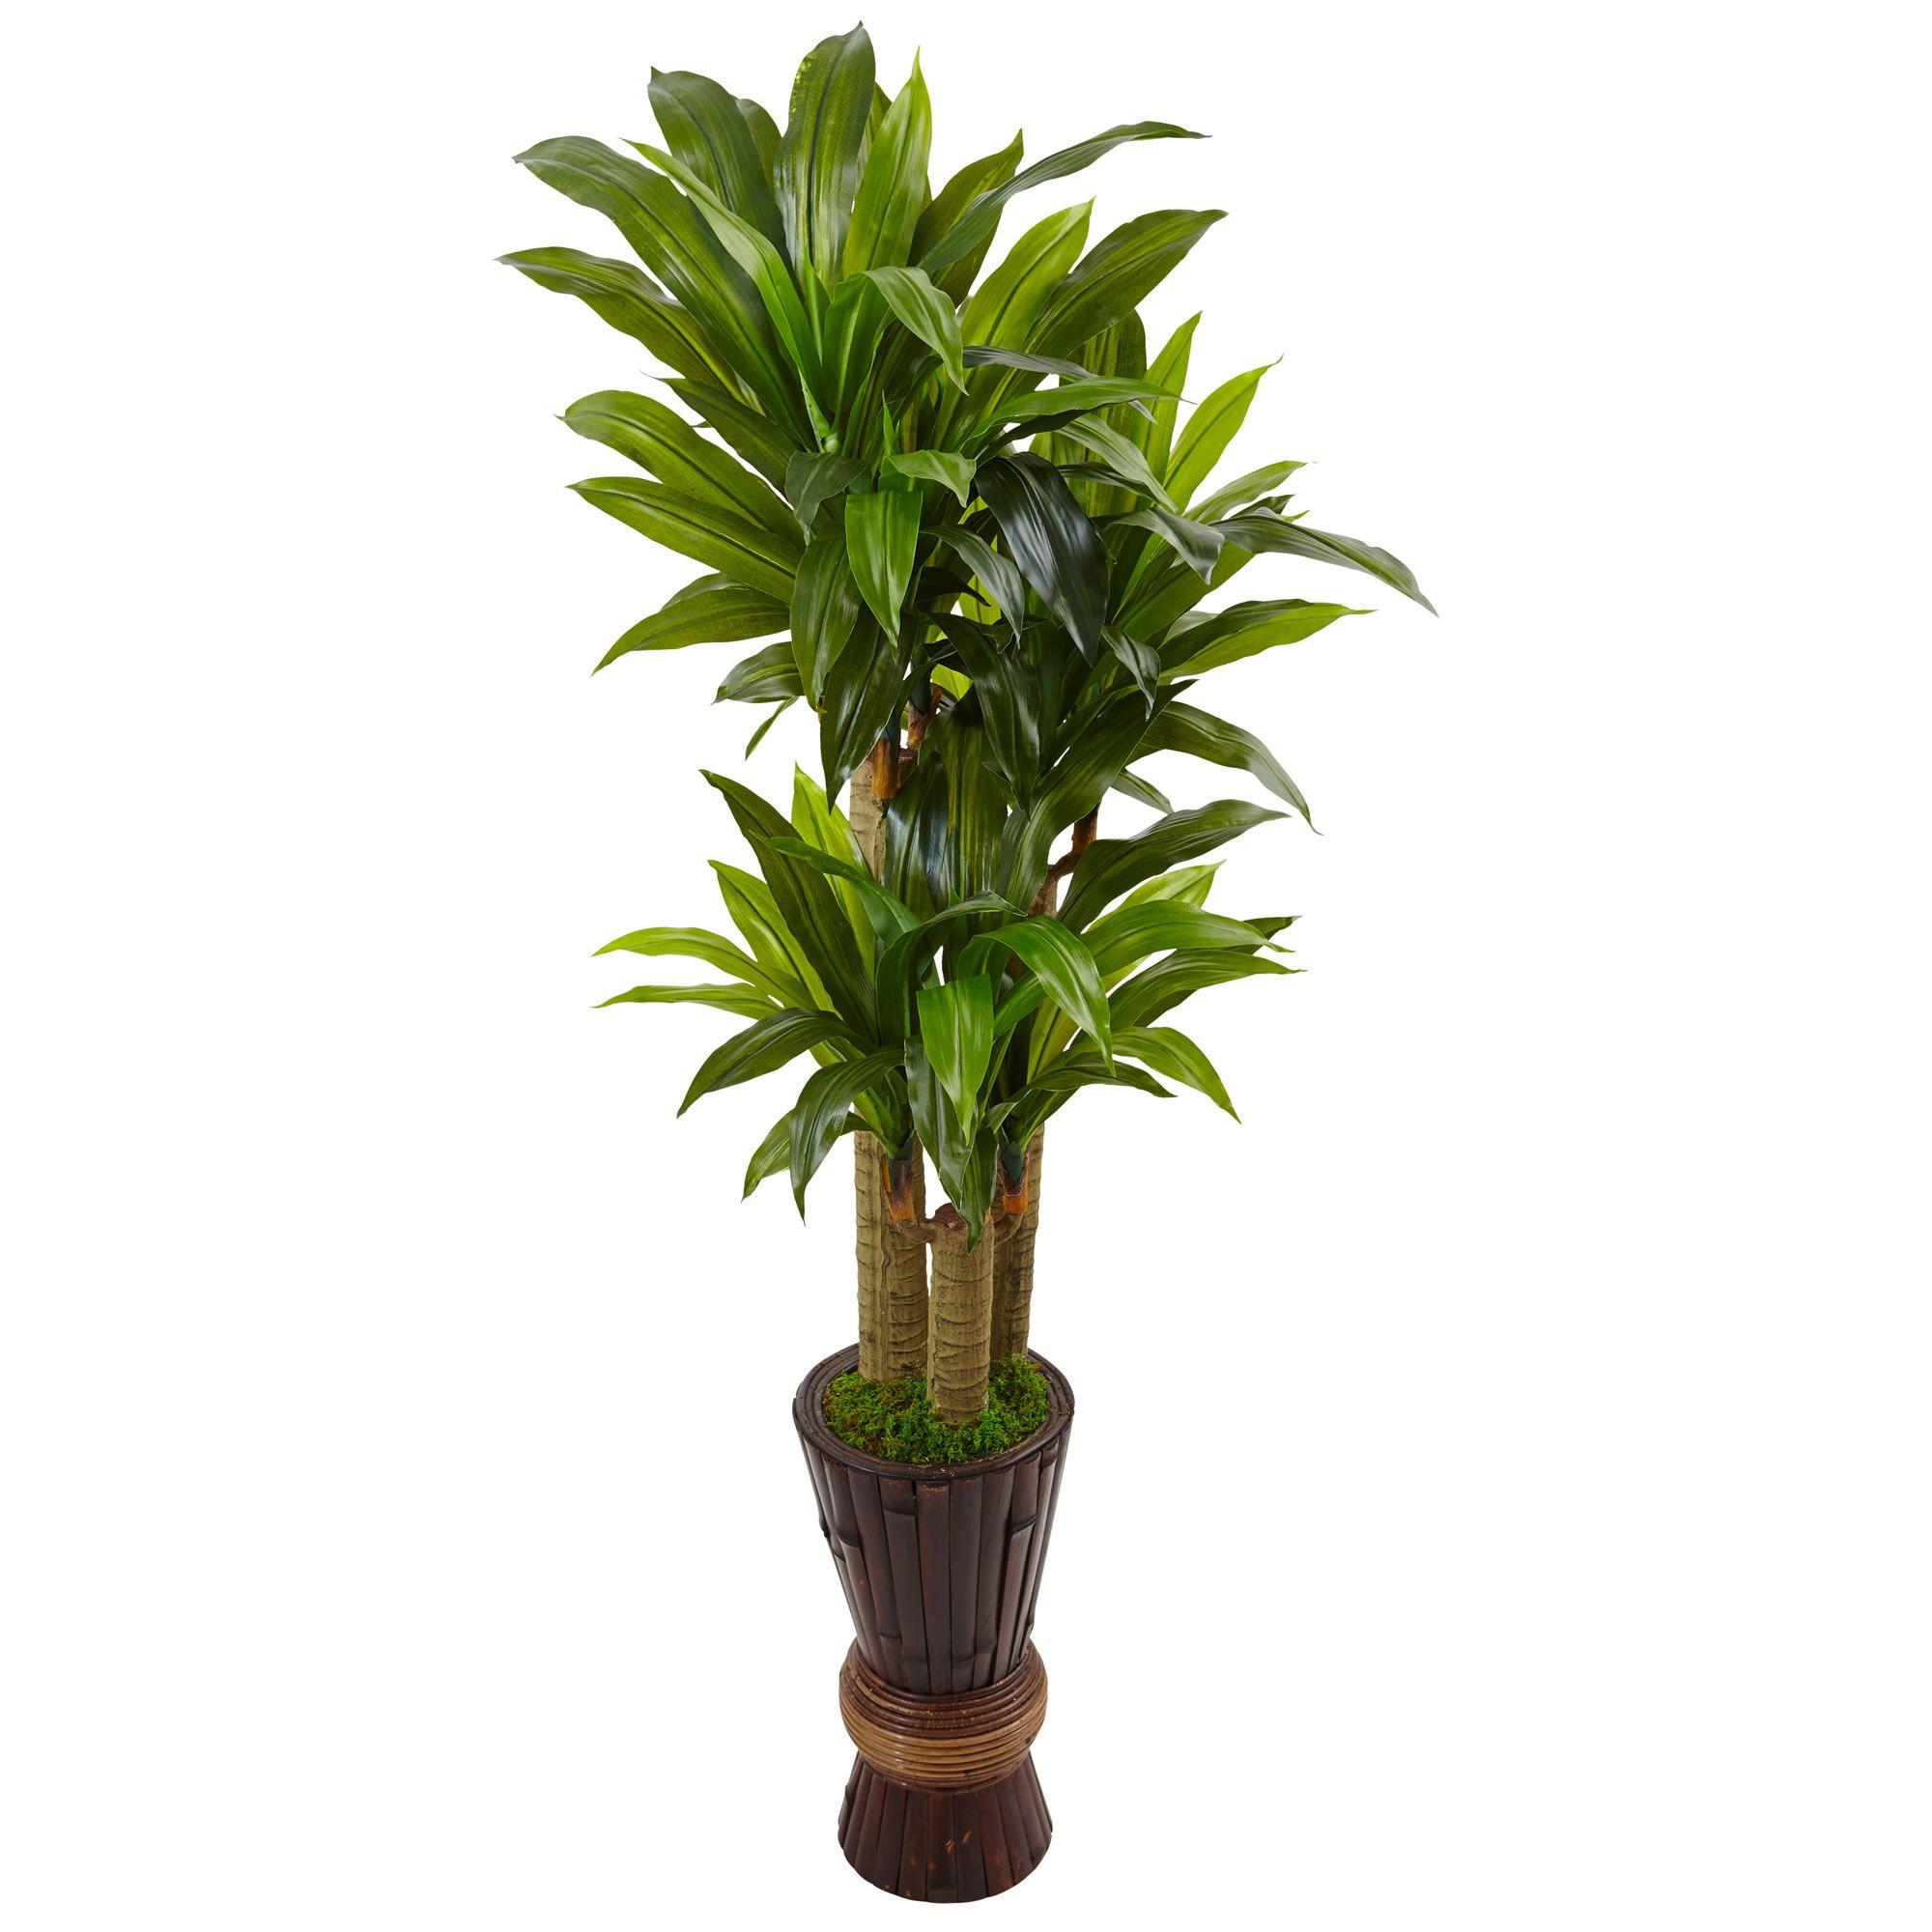 5 Cornstalk Dracaena Plant In Wooden Planter Nearly Natural Artificial Foliage Dracaena Plant Small Artificial Plants